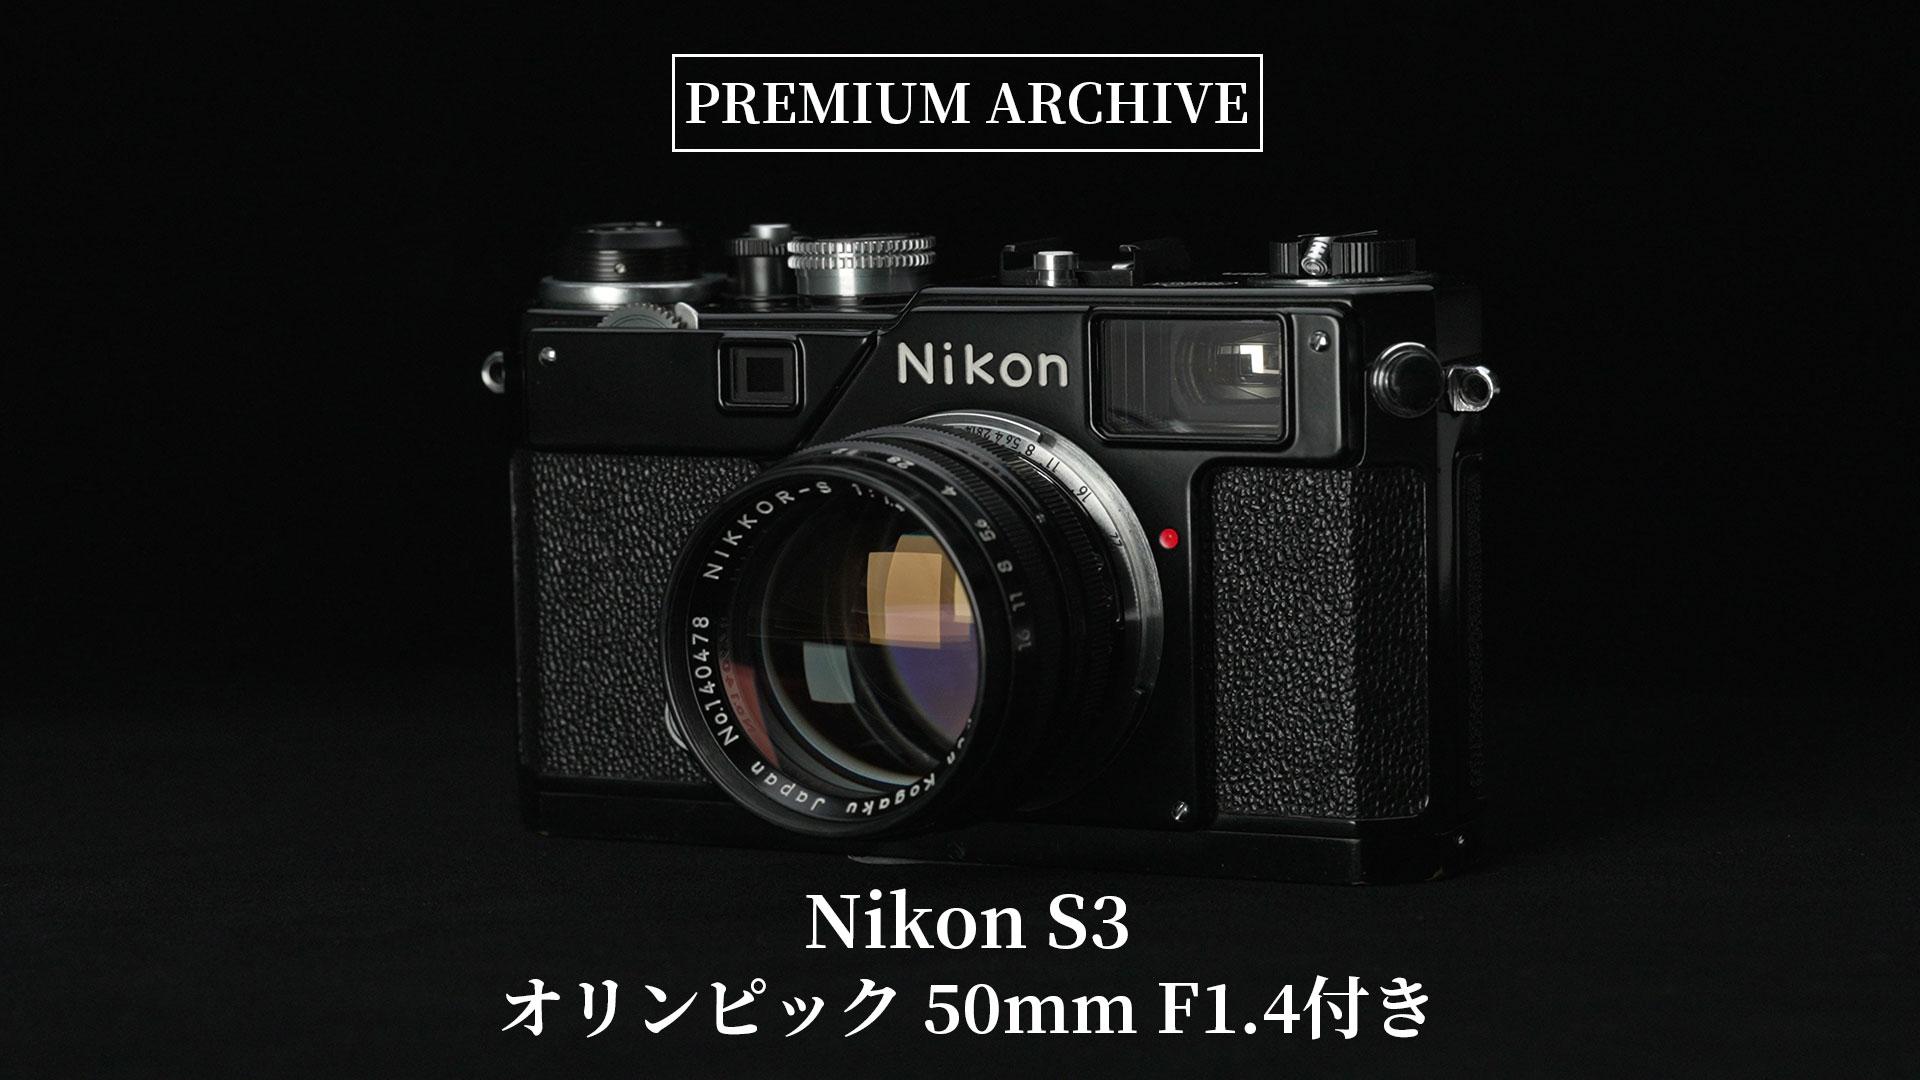 【PREMIUM ARCHIVE #05】Nikon S3 オリンピック 50mm F1.4付き